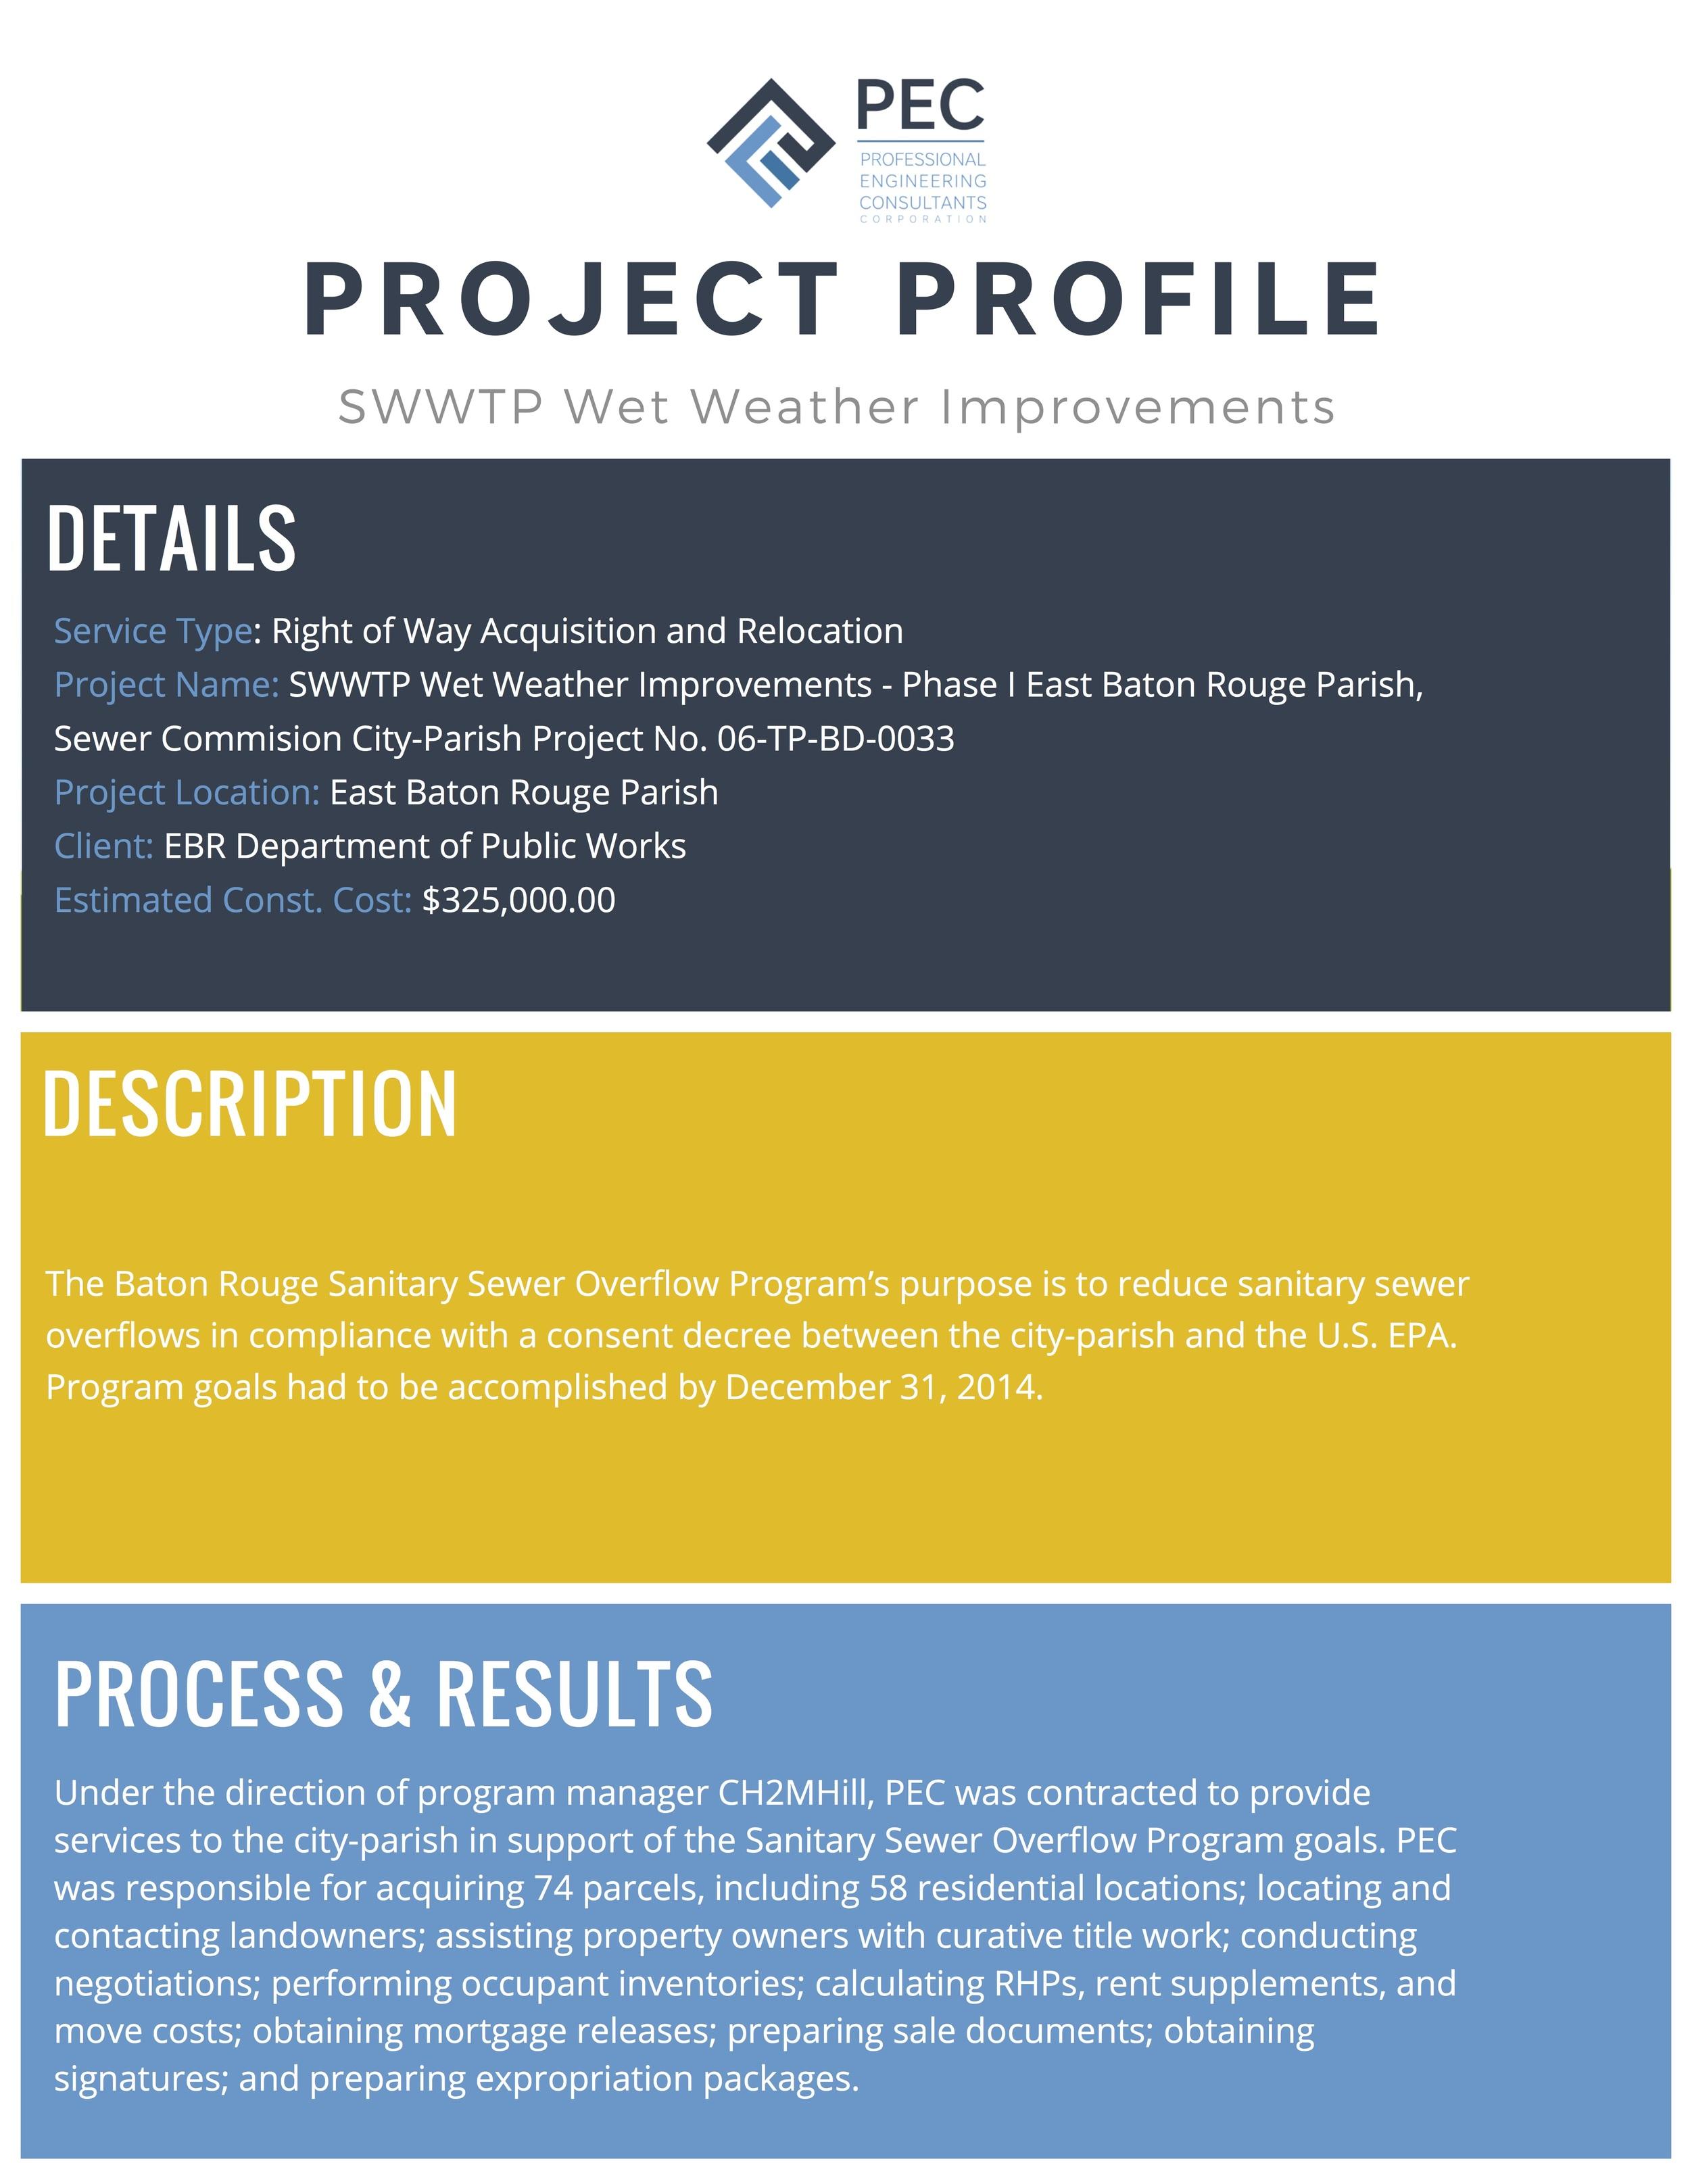 Project Profile_SWWTP Wet Weather Improvements.jpg